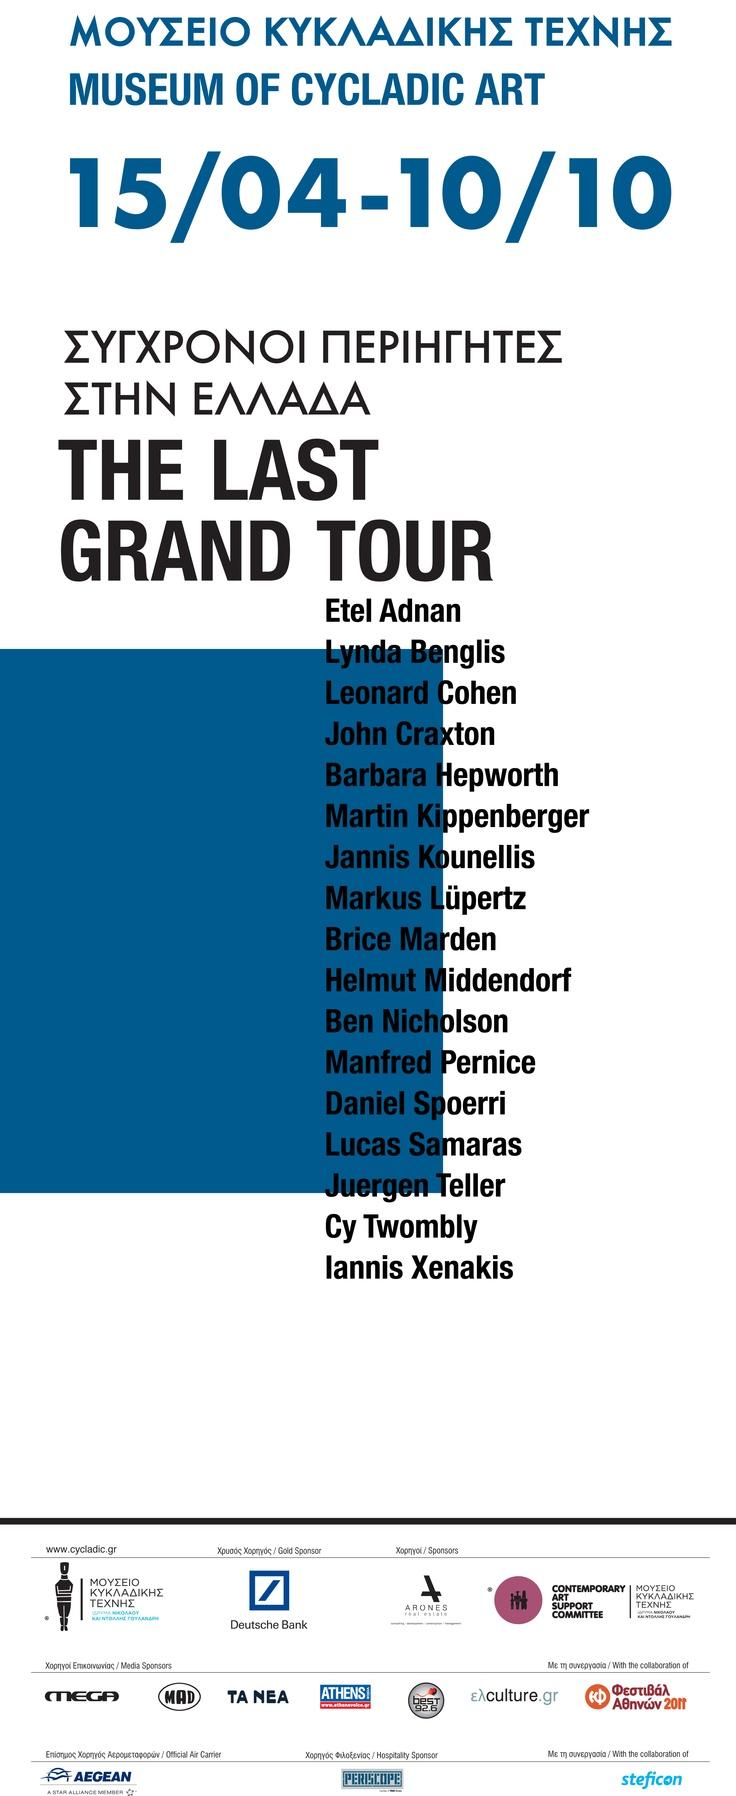 """The Last Grand Tour"" exhibition poster"